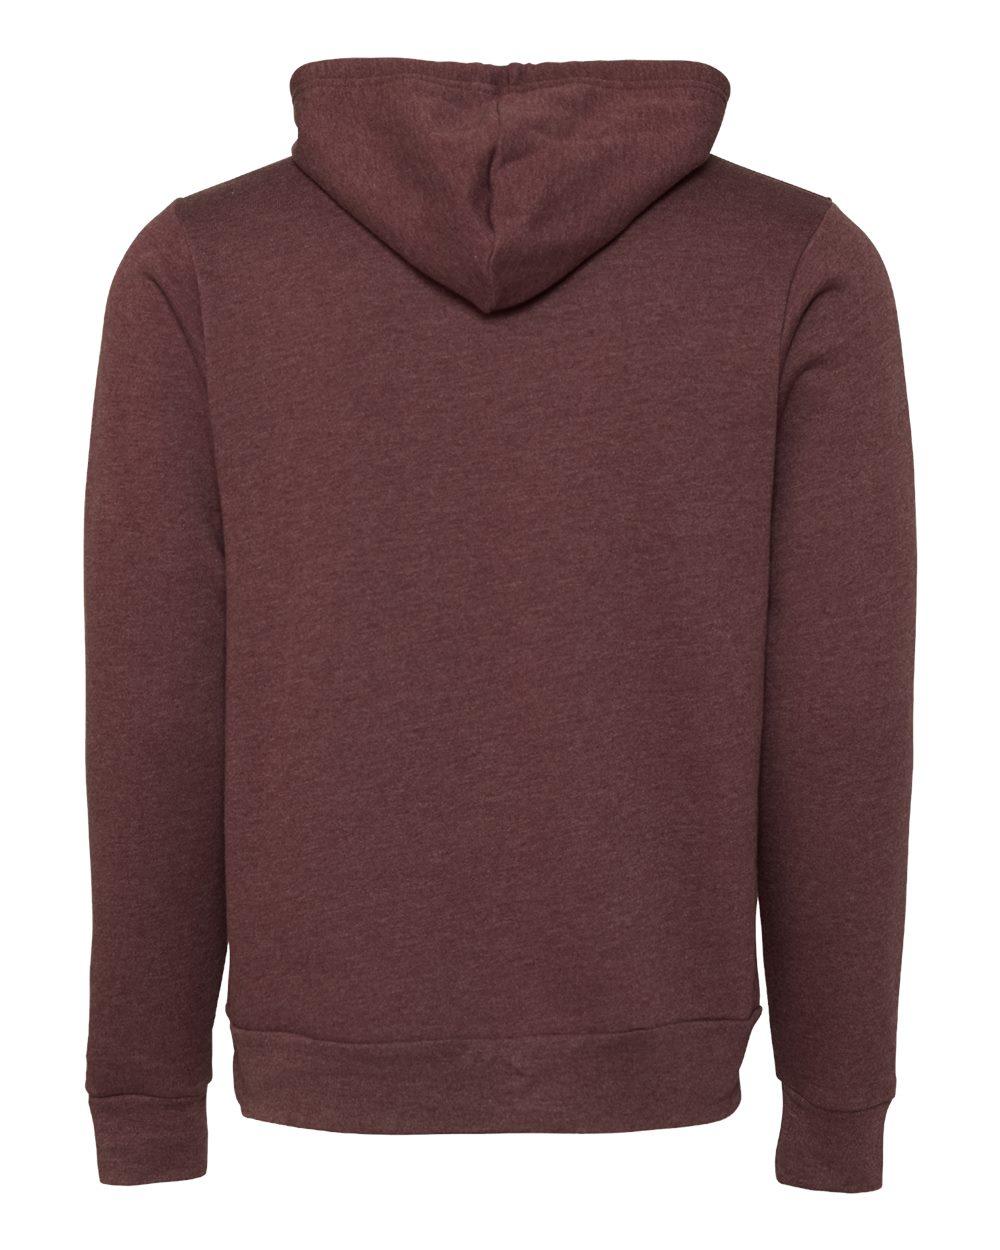 Bella-Canvas-Unisex-Sponge-Hooded-Pullover-Sweatshirt-Blank-3719-up-to-2XL thumbnail 47